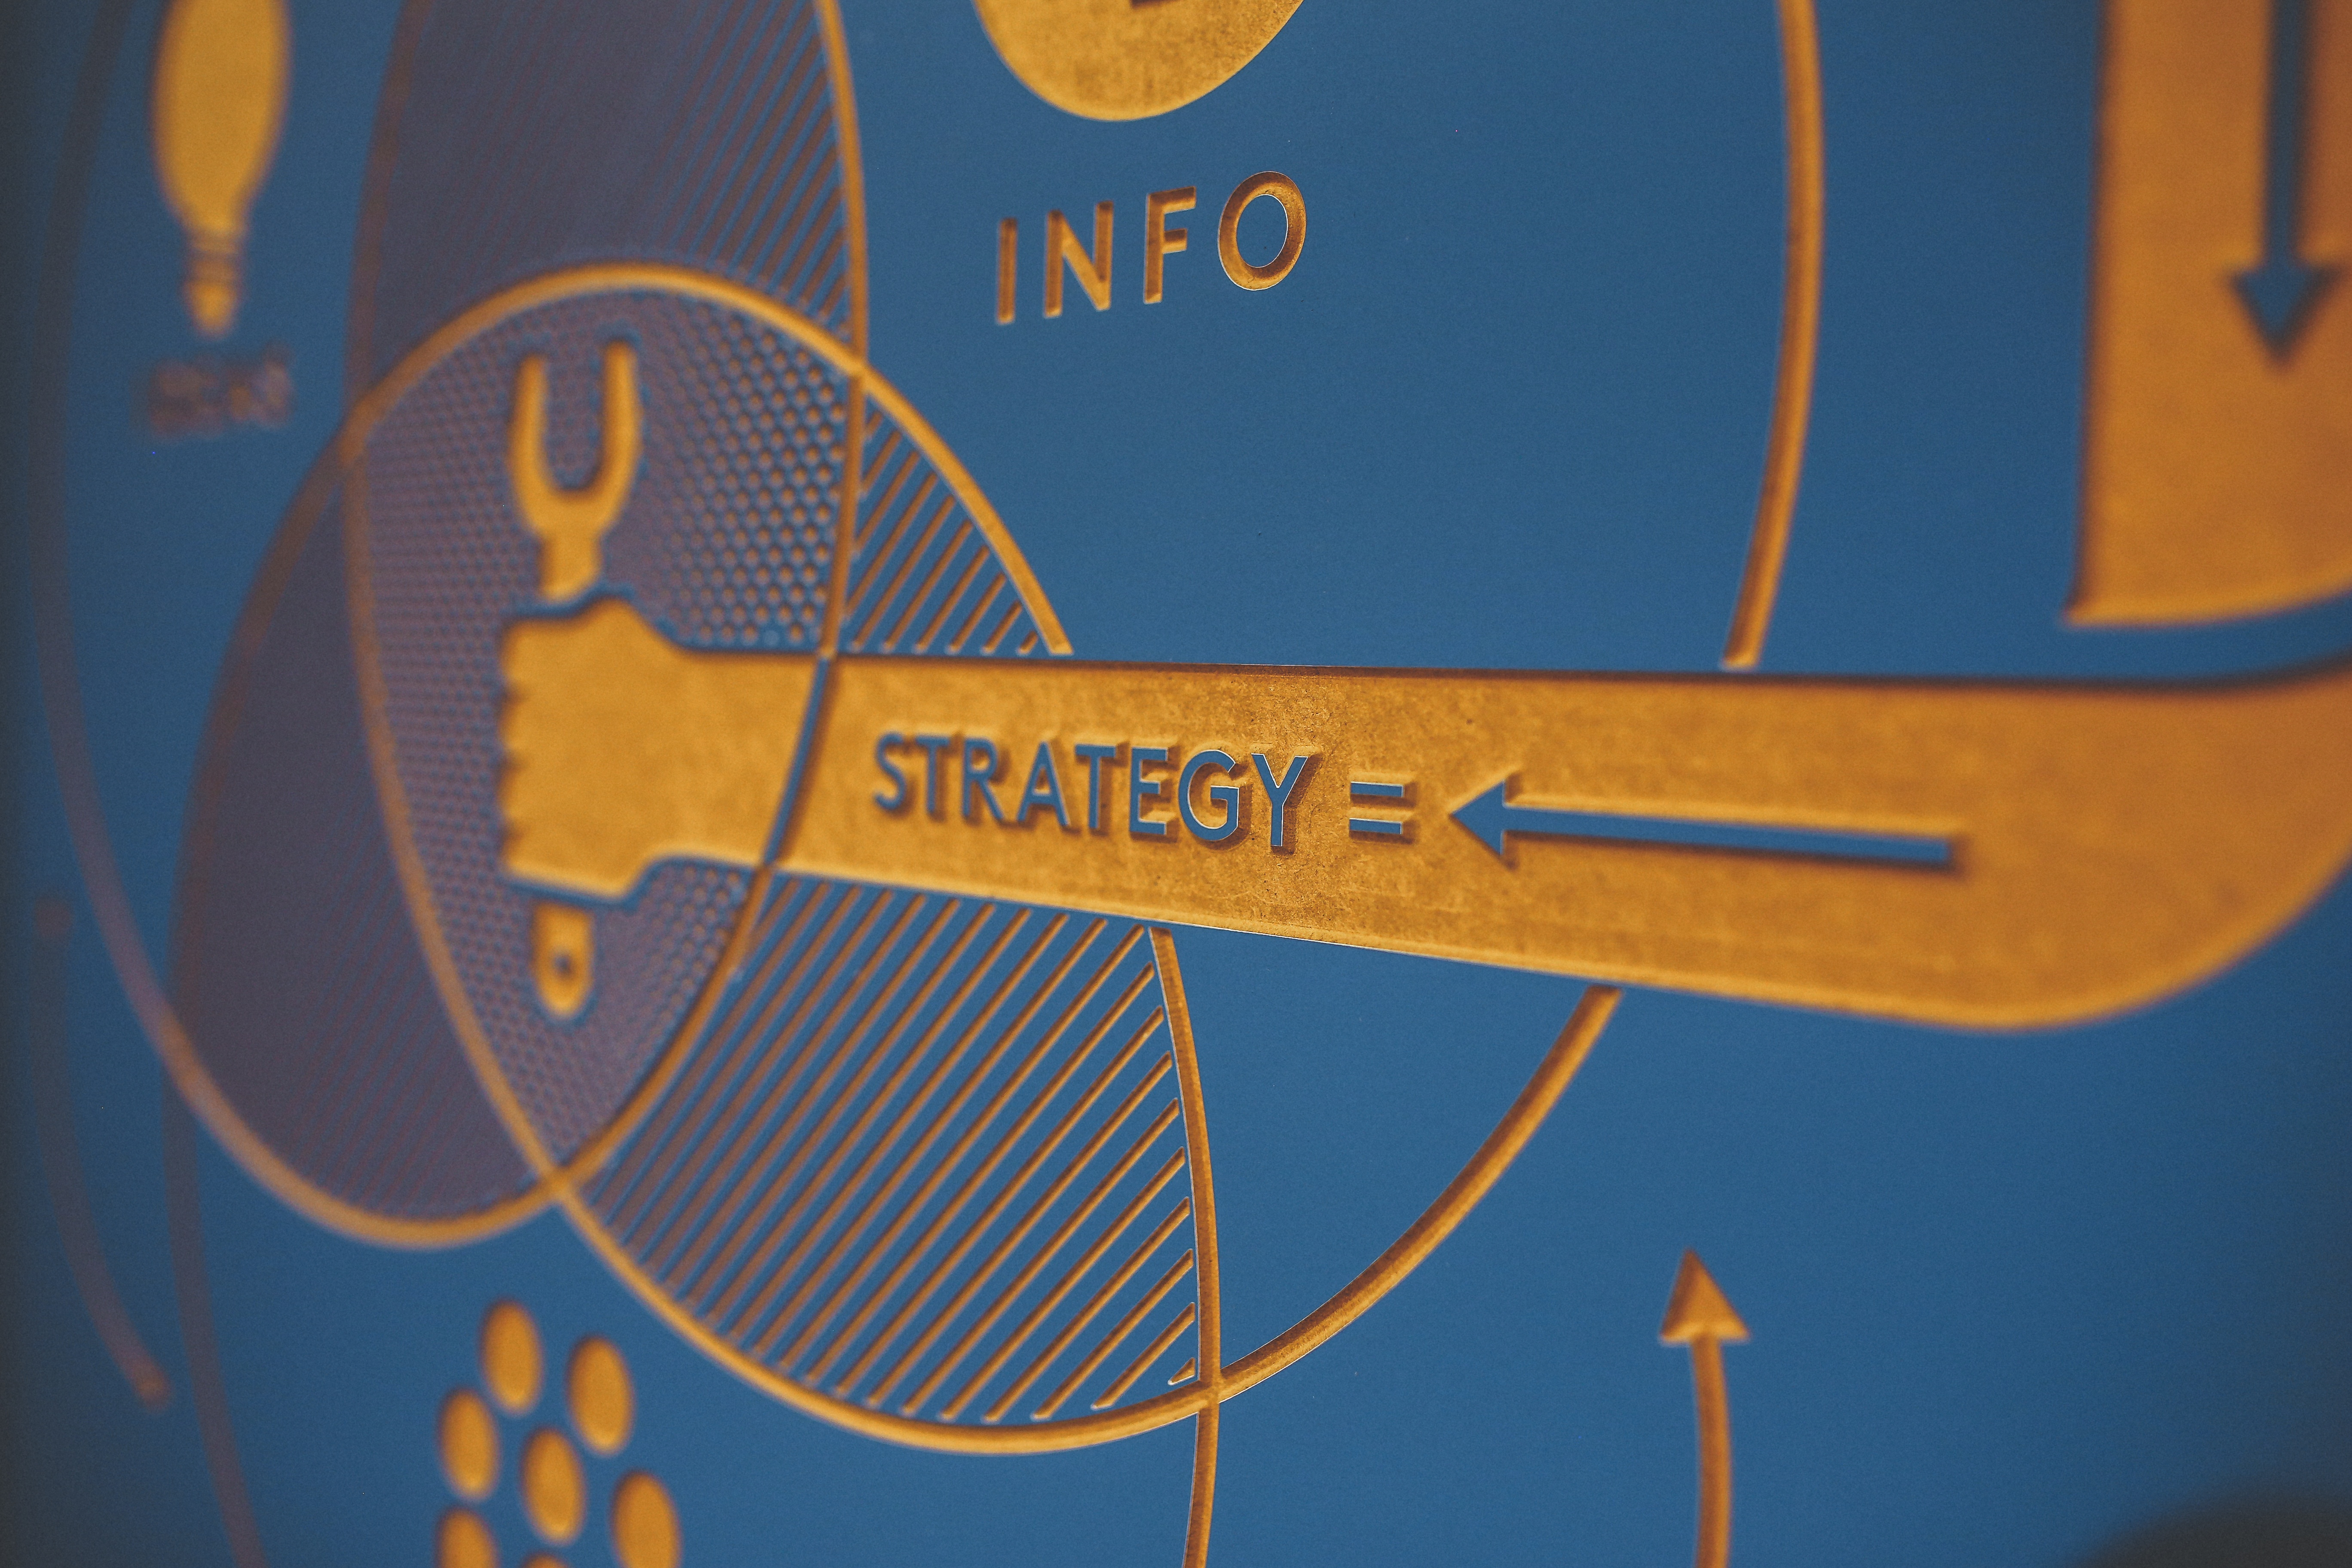 Reinvigorating_your_marketing_strategy.jpg